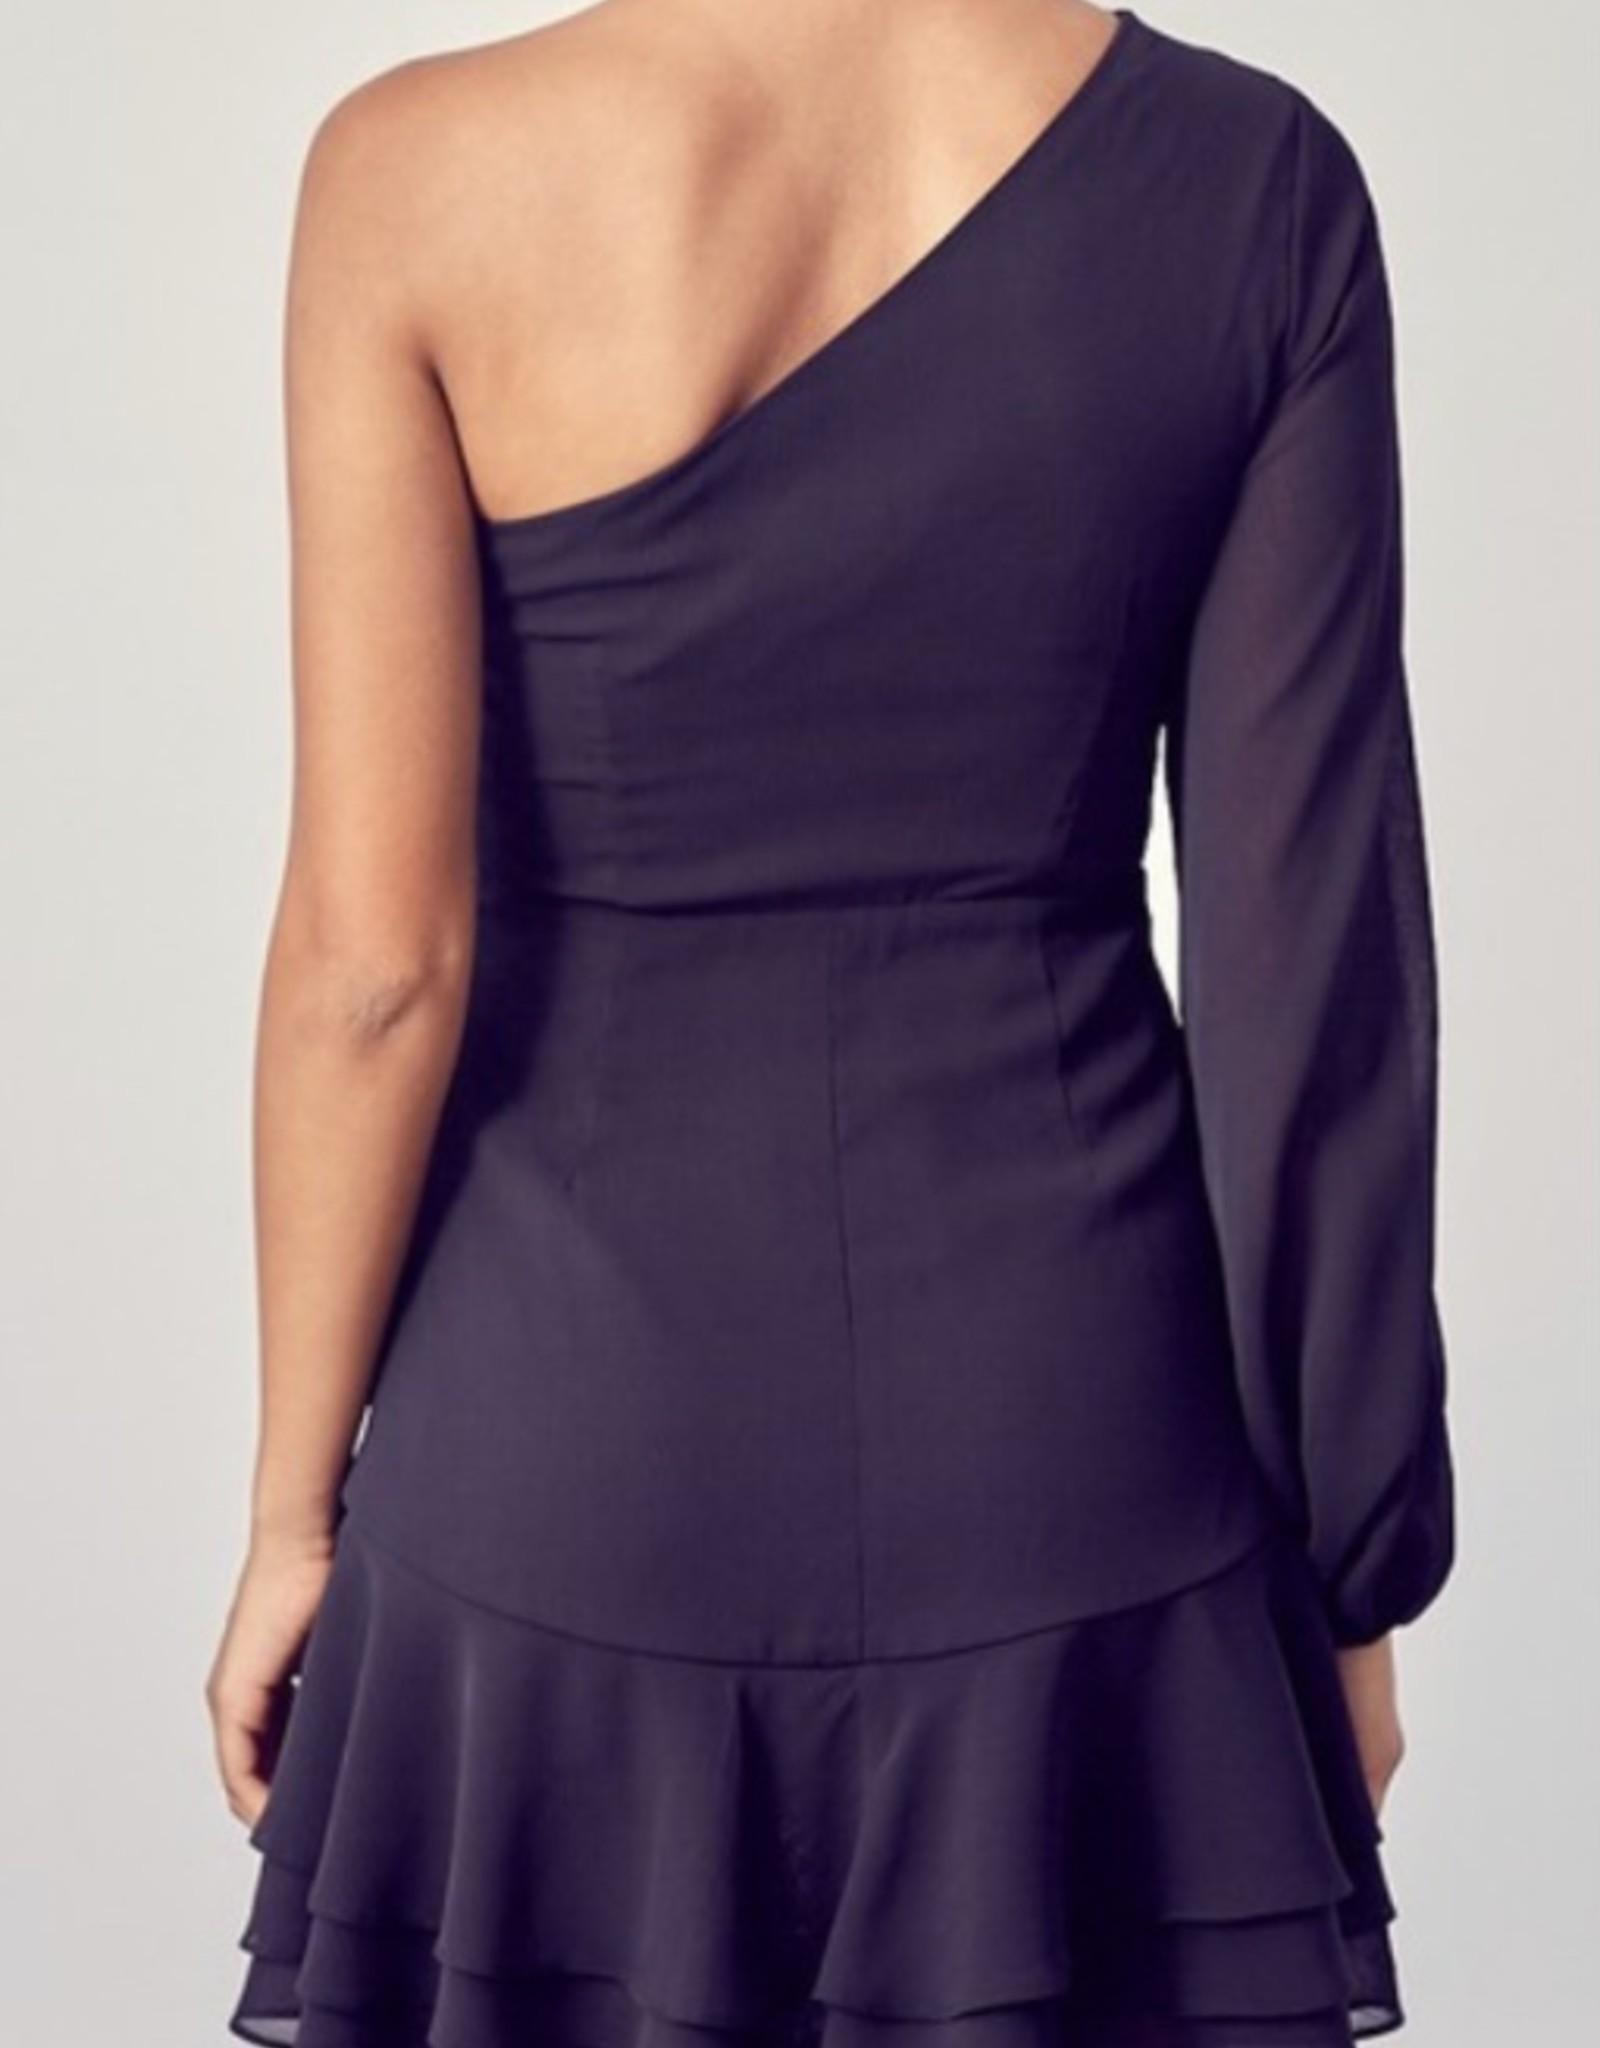 The Blake Dress